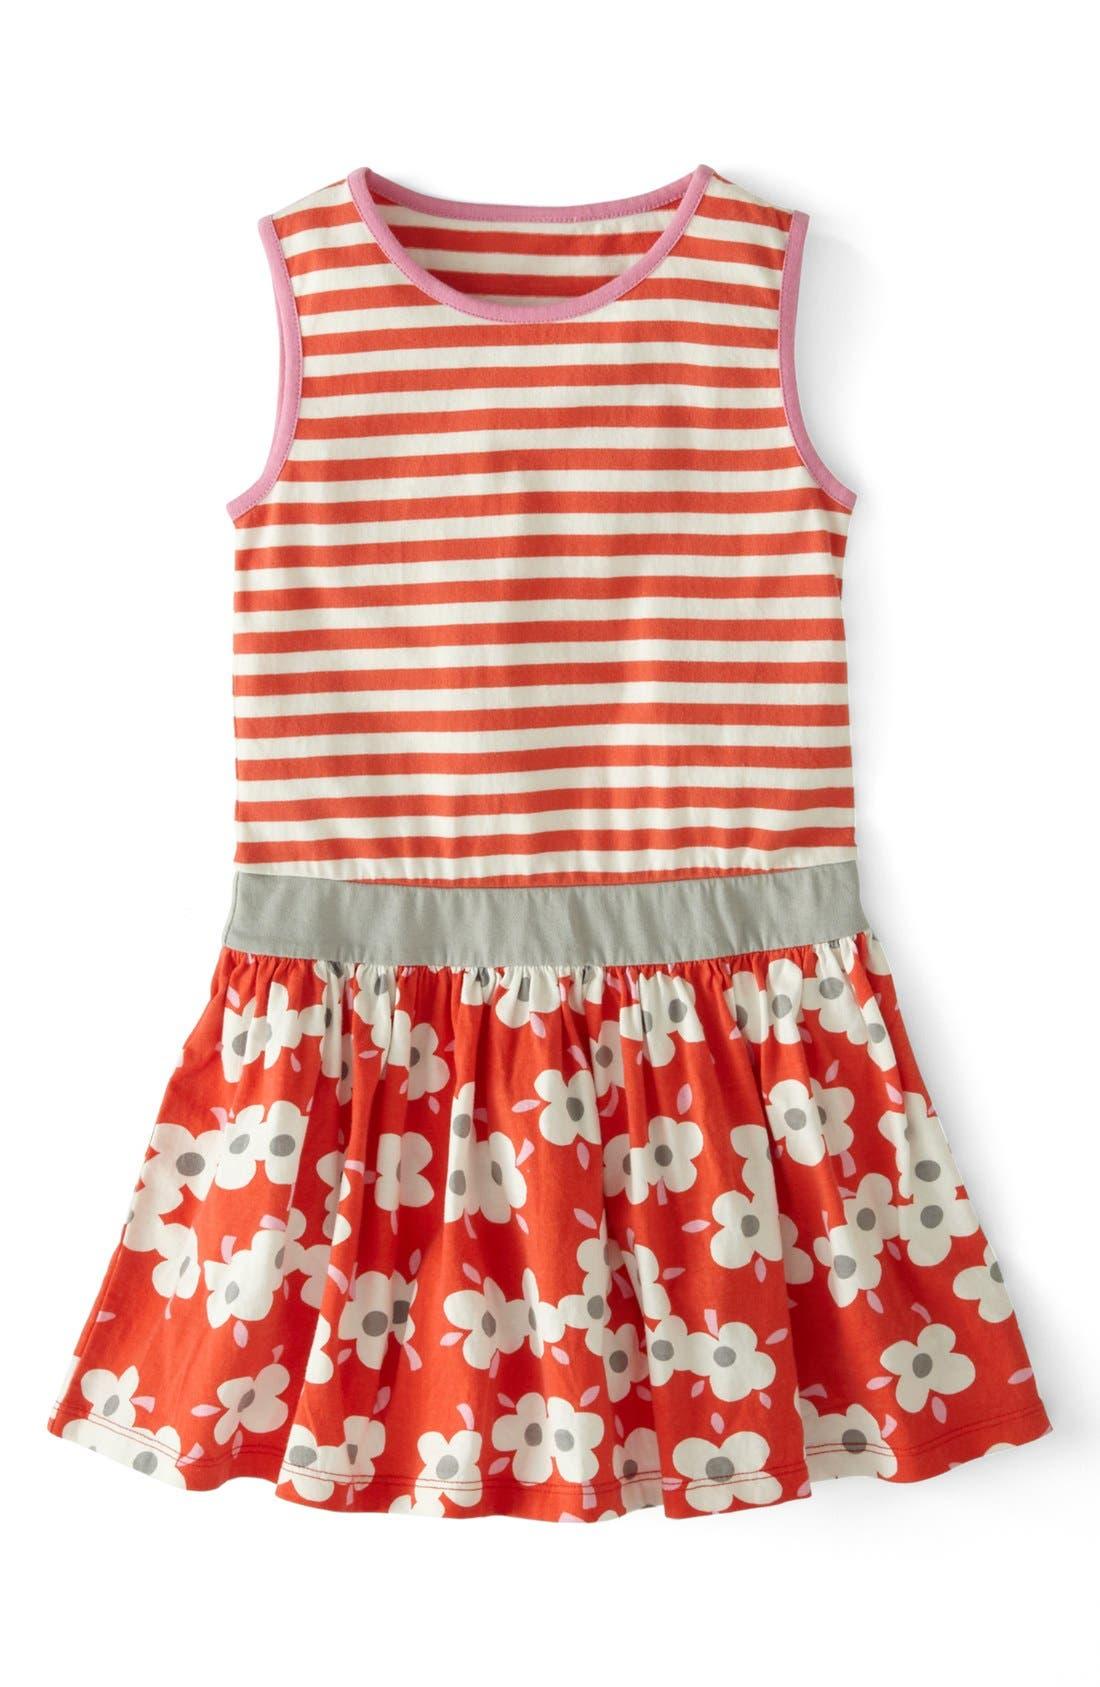 Alternate Image 1 Selected - Mini Boden 'Jolly' Cotton Jersey Dress (Toddler Girls)